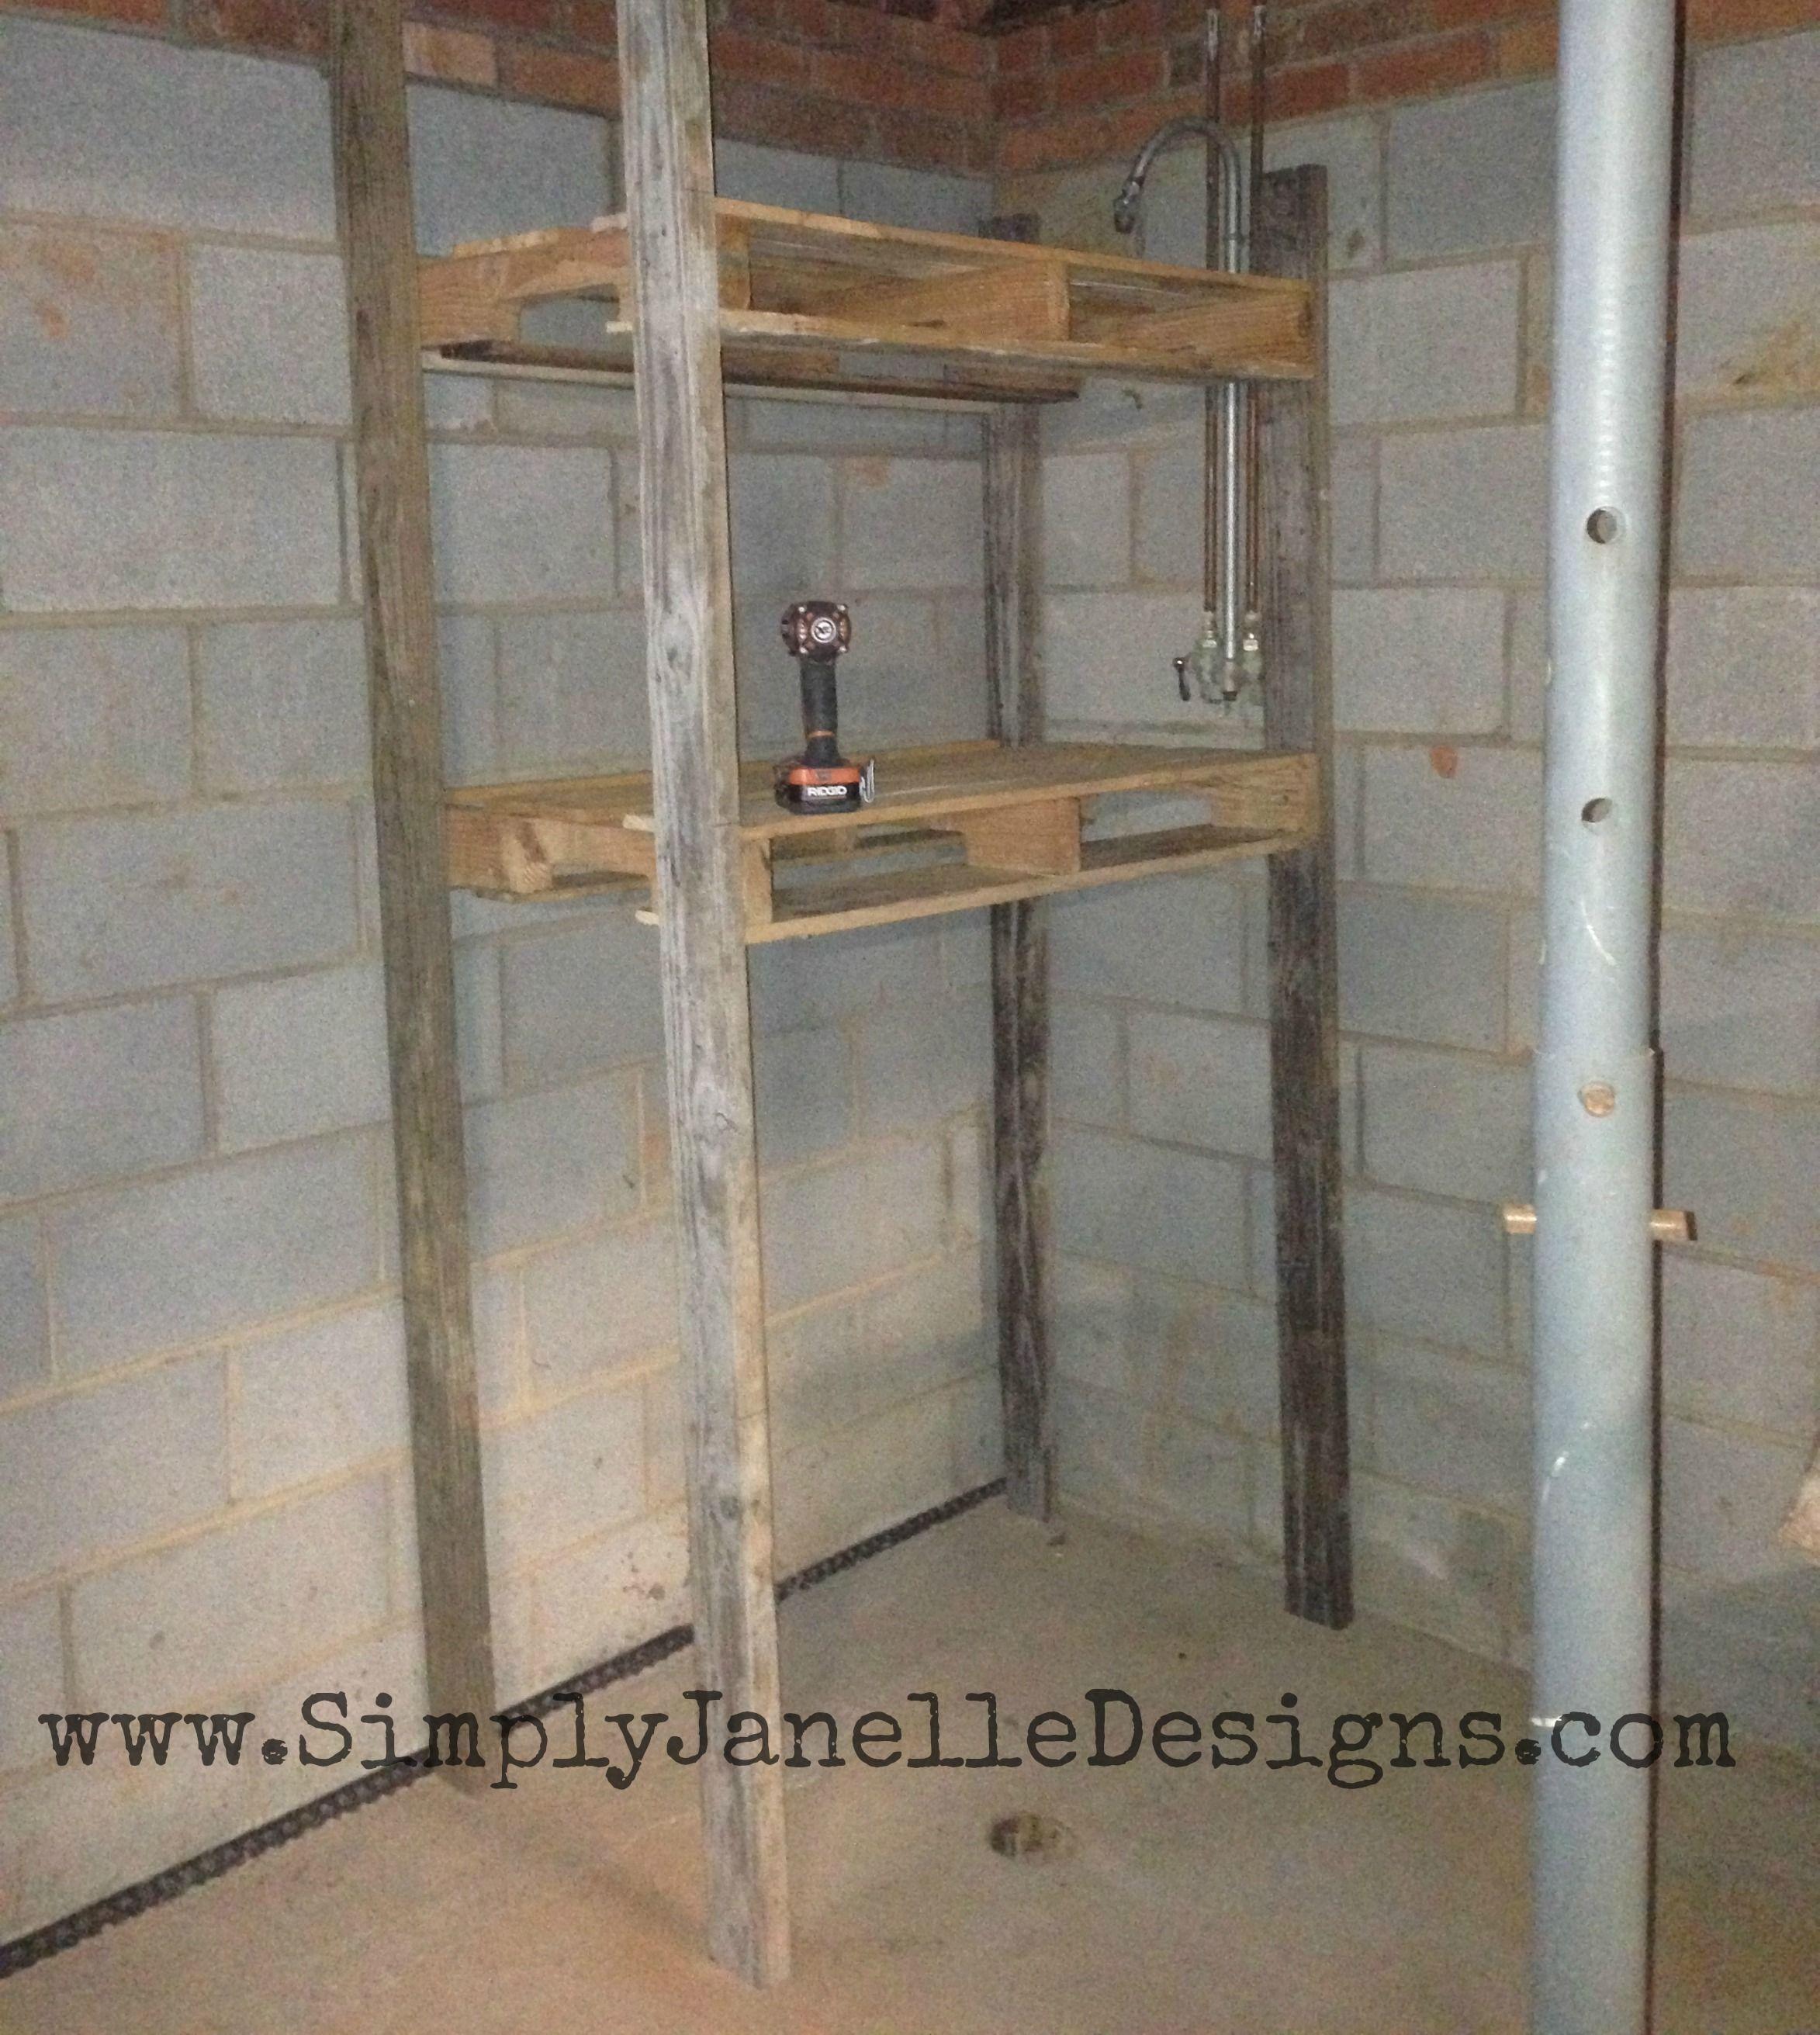 Simply Janelle Designs Basement First Shelf